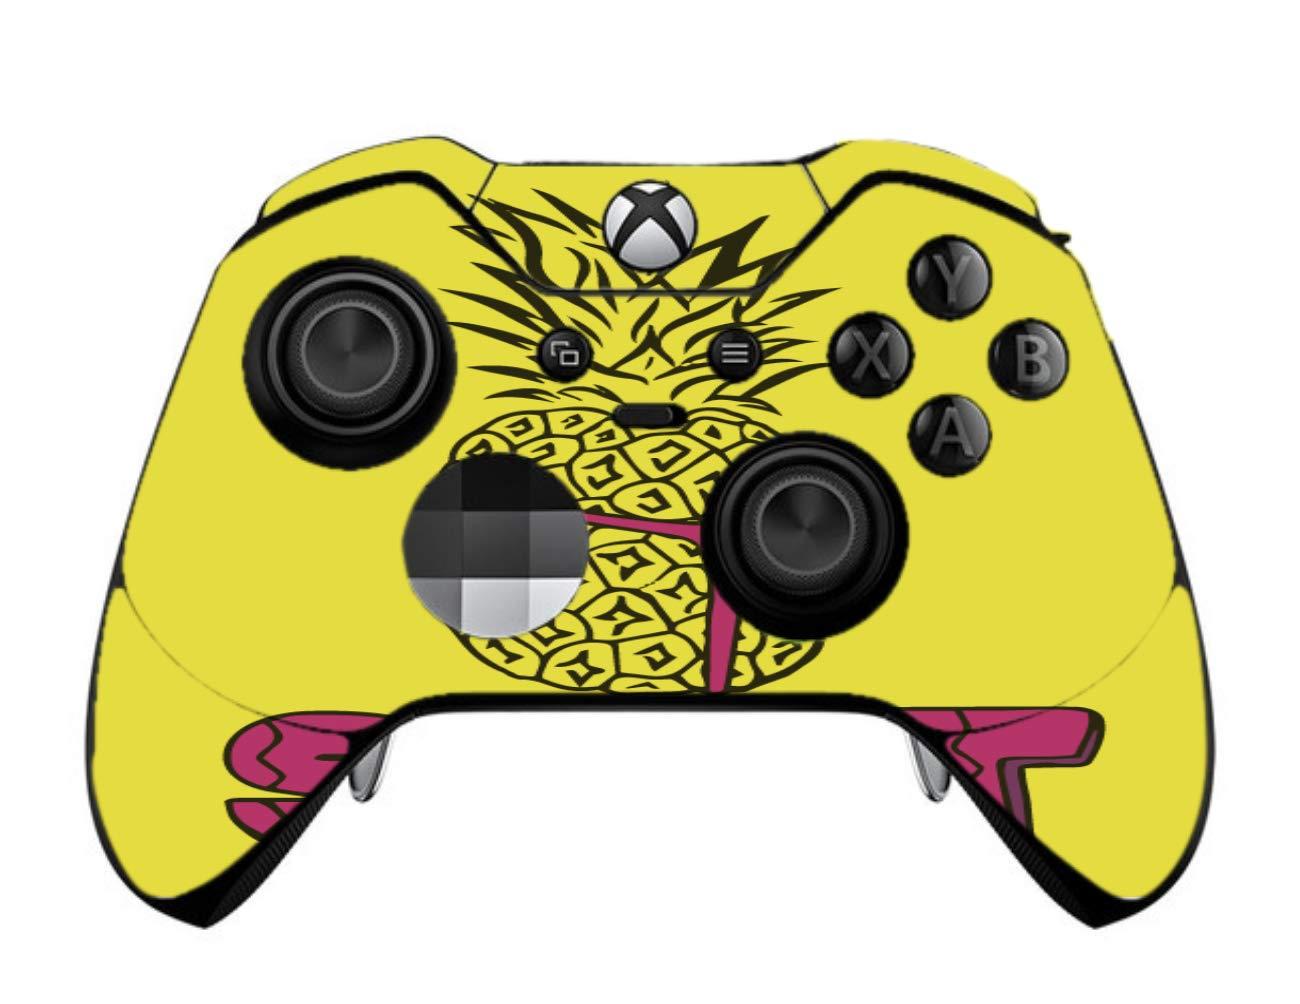 Slut Pineapple Vinyl Decal Sticker Skin by egeek amz for Xbox One Elite Controller